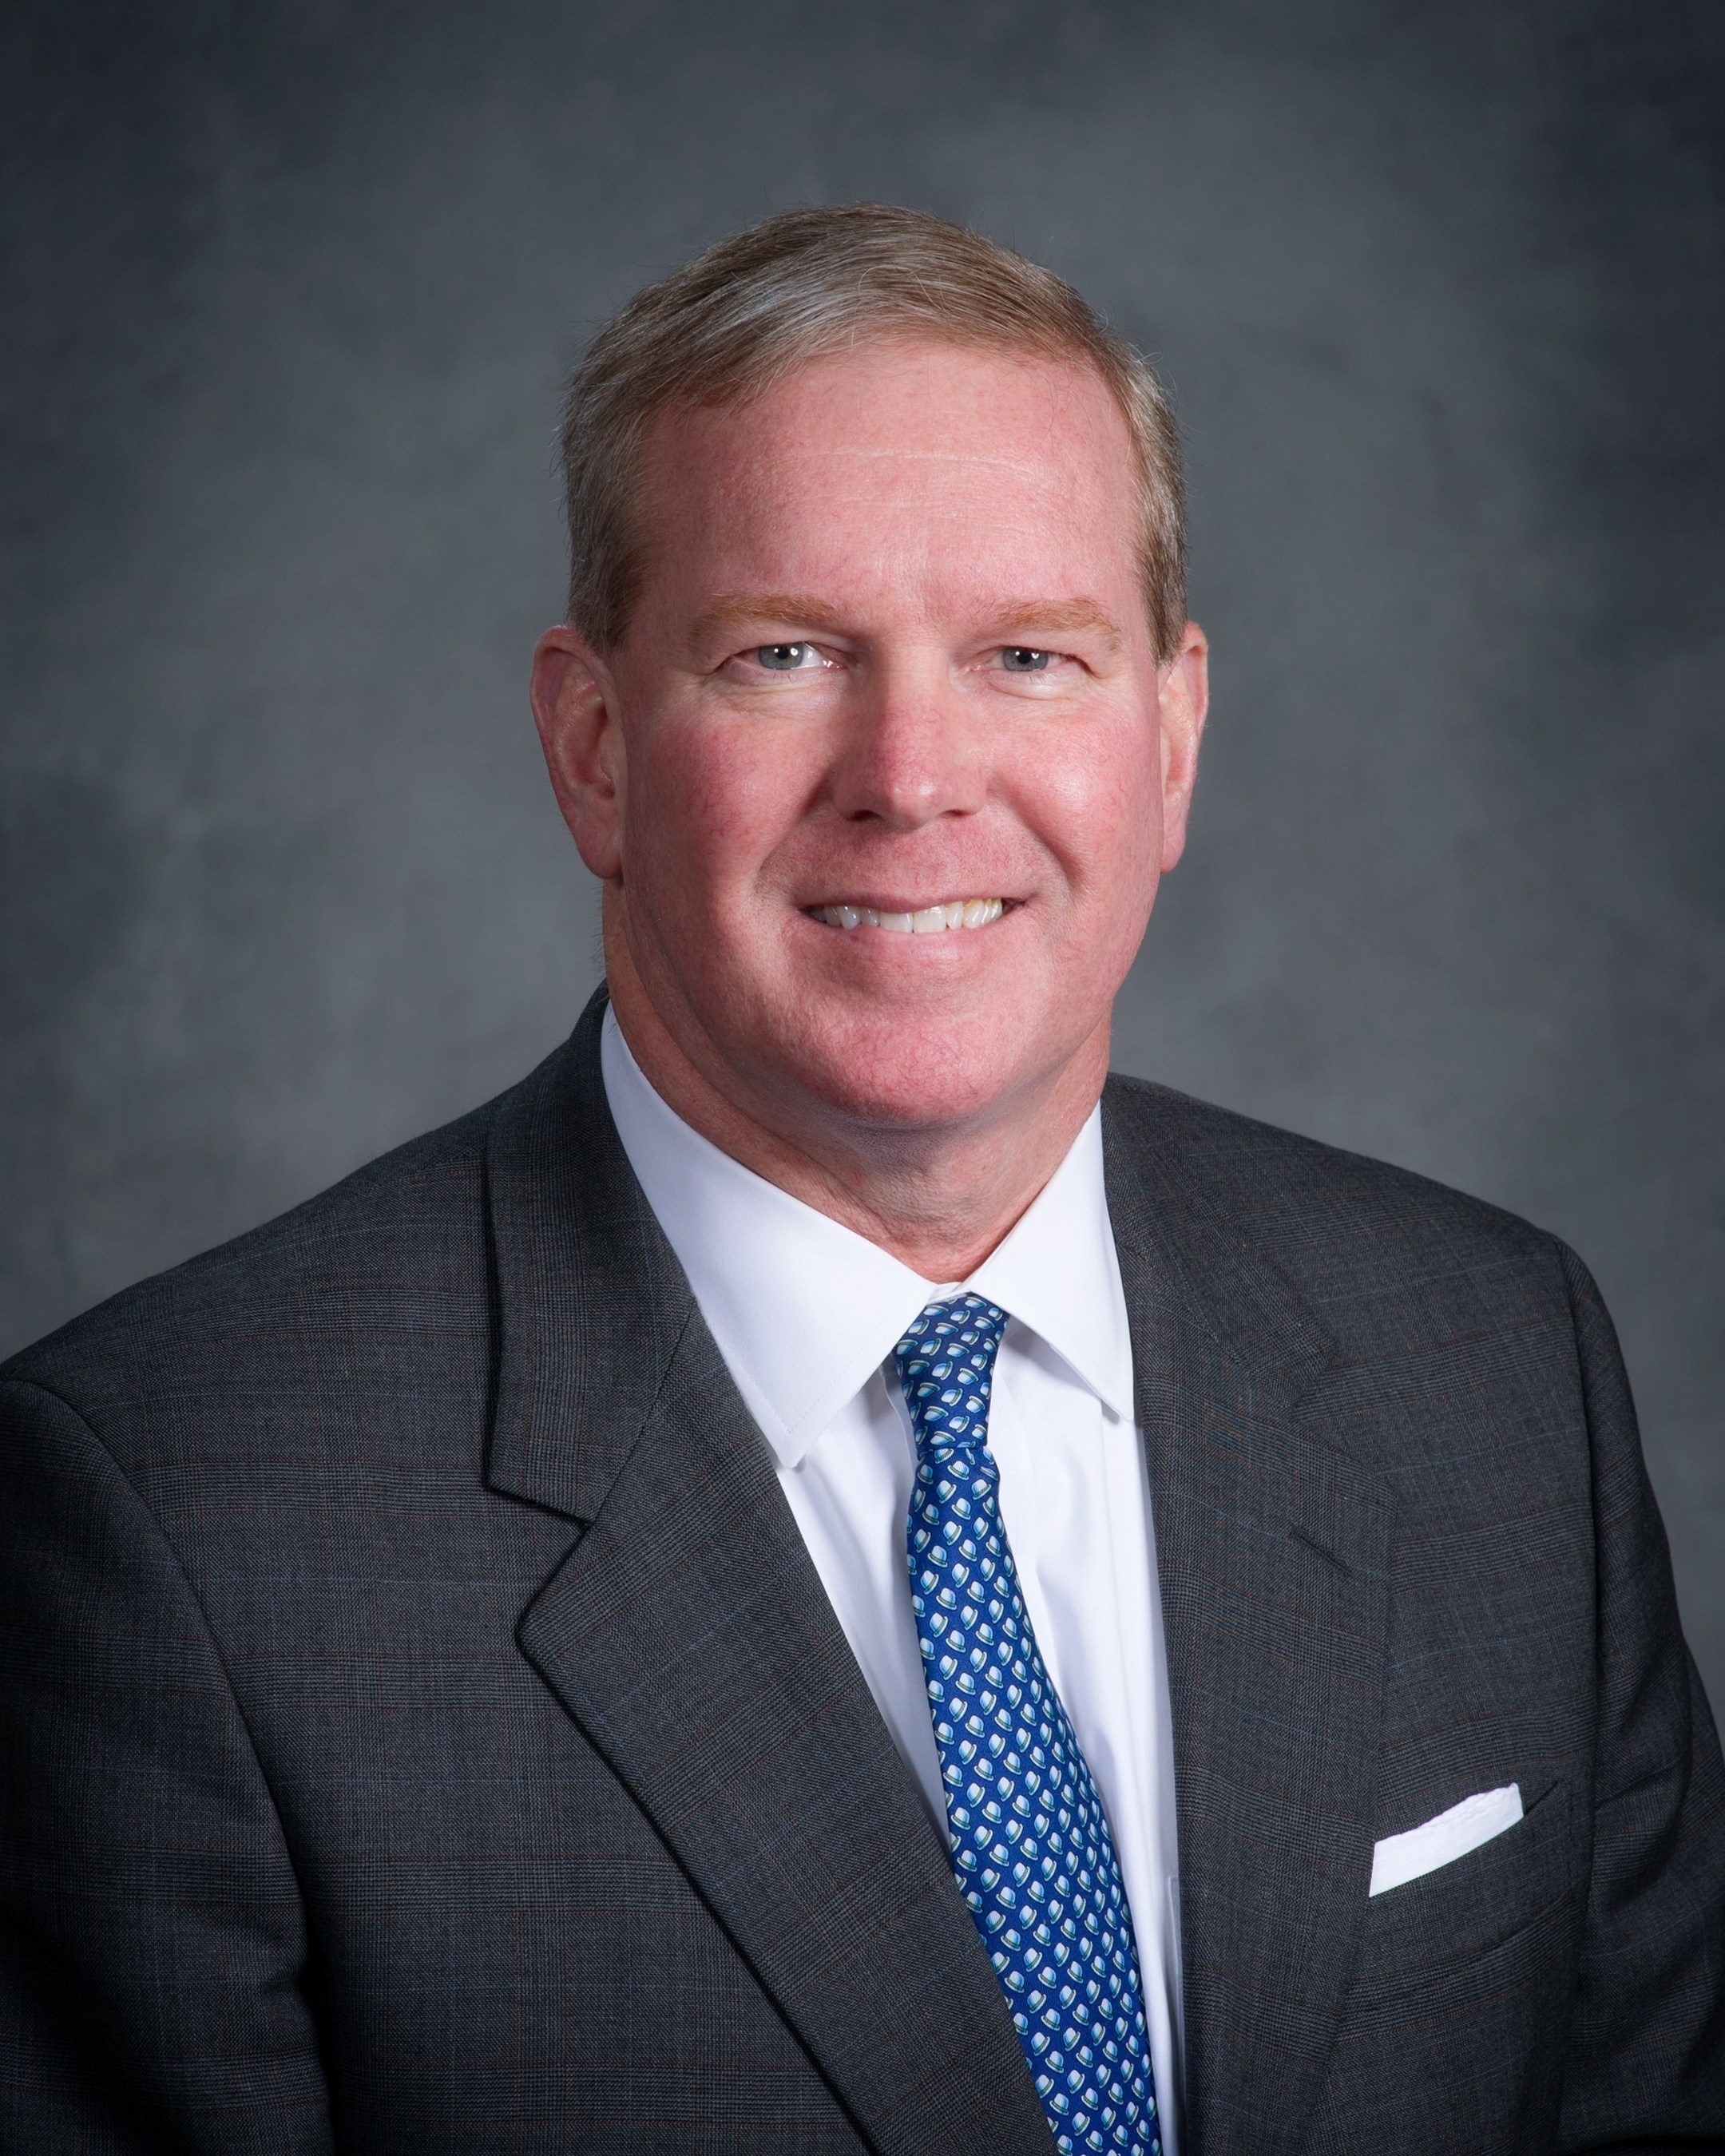 John H. (Jay) Gibson named as new CEO of XCOR Aerospace